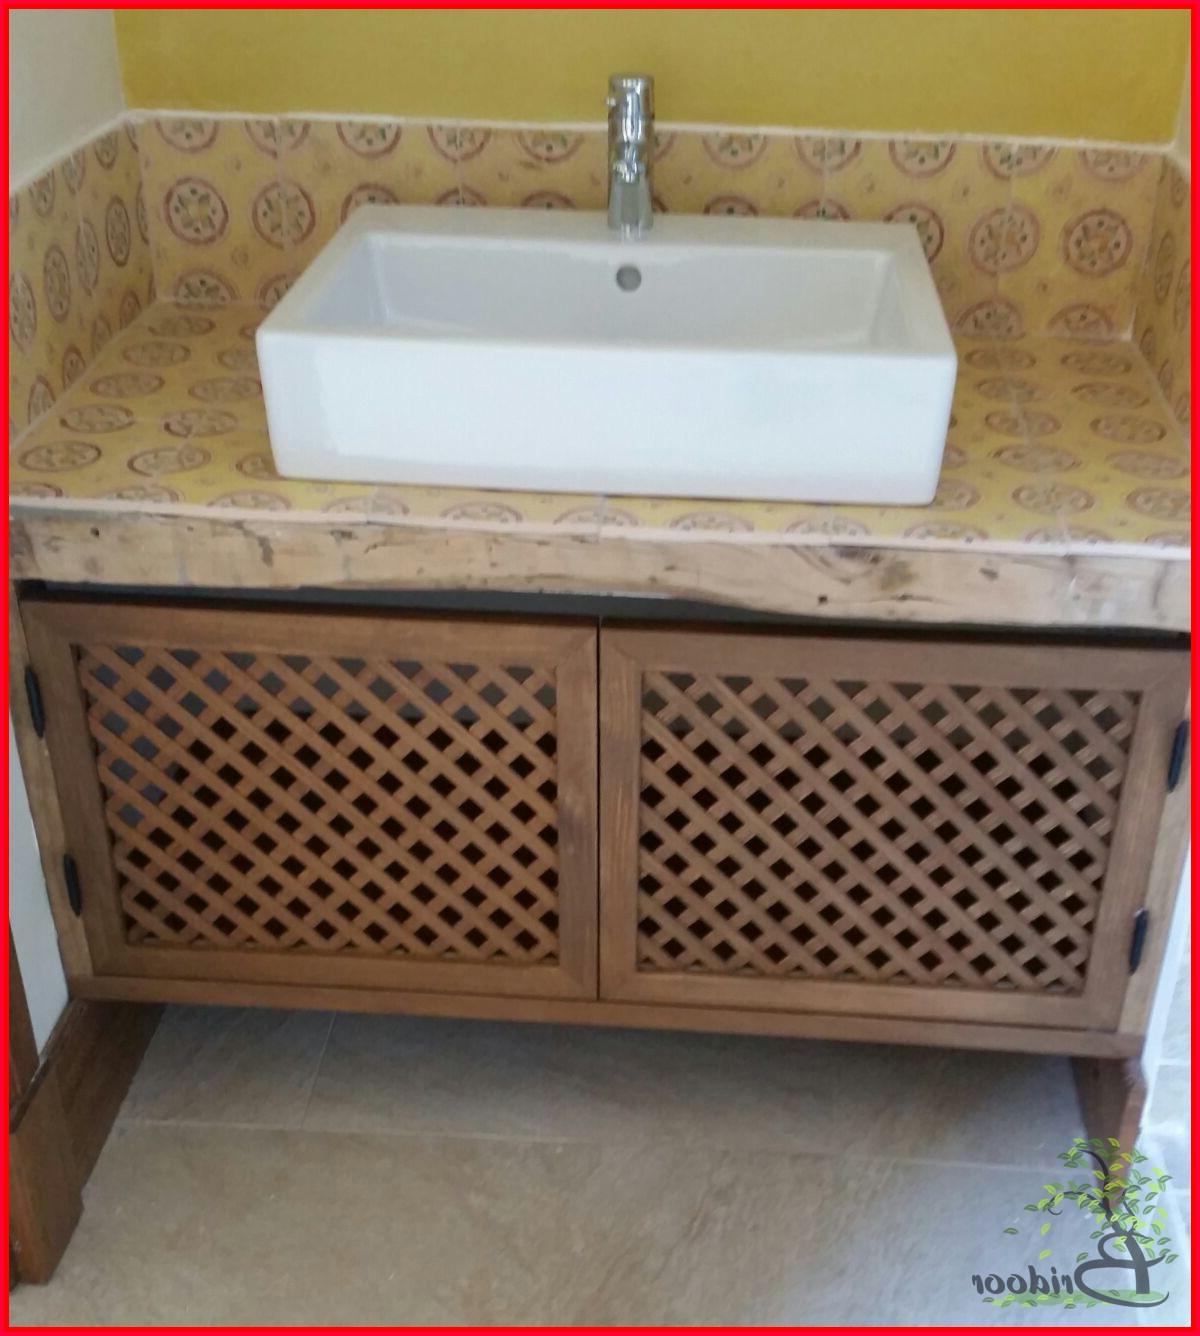 Muebles De Baño De Madera Ipdd Muebles De Baà O Rusticos Muebles De BaO Rustico Muebles Para